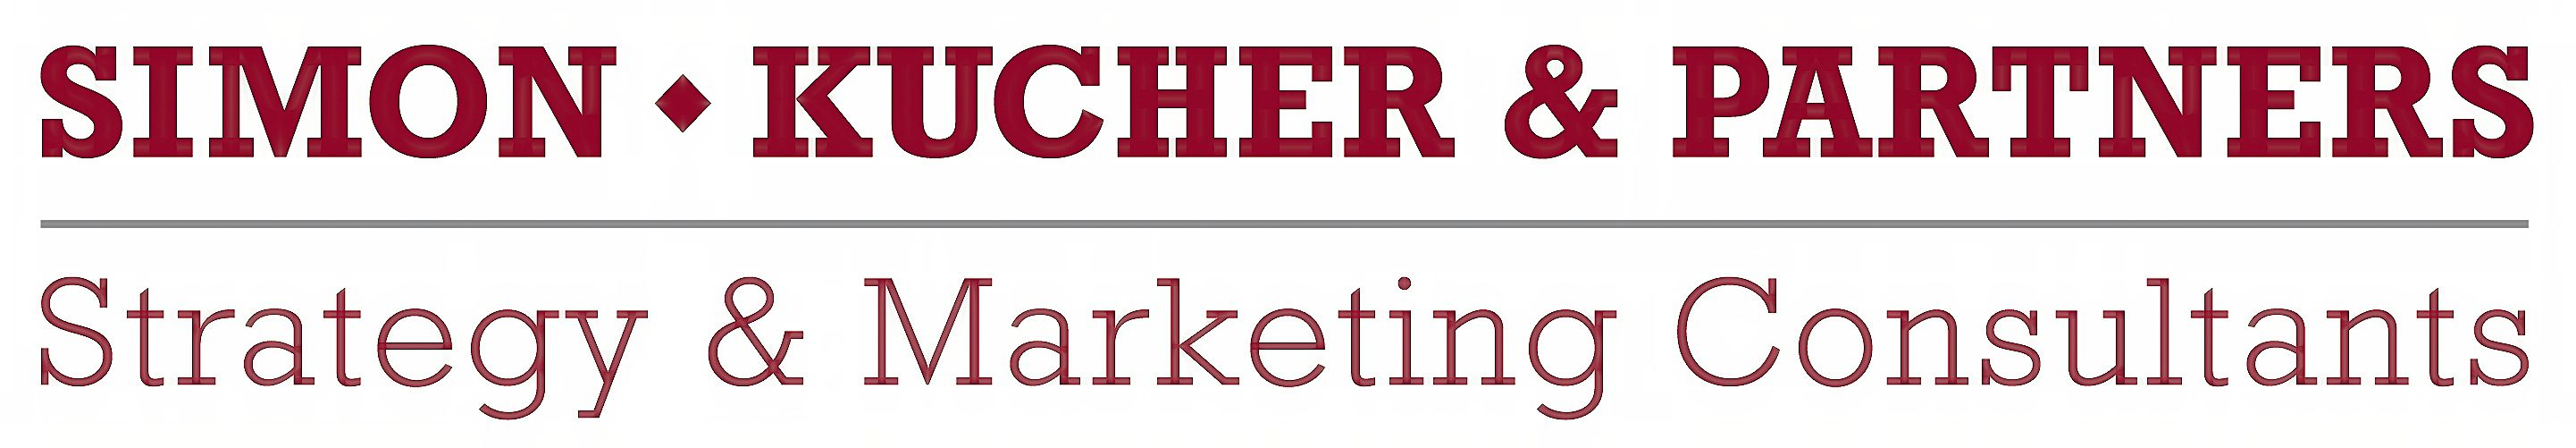 Simon Kucher & Partners logo